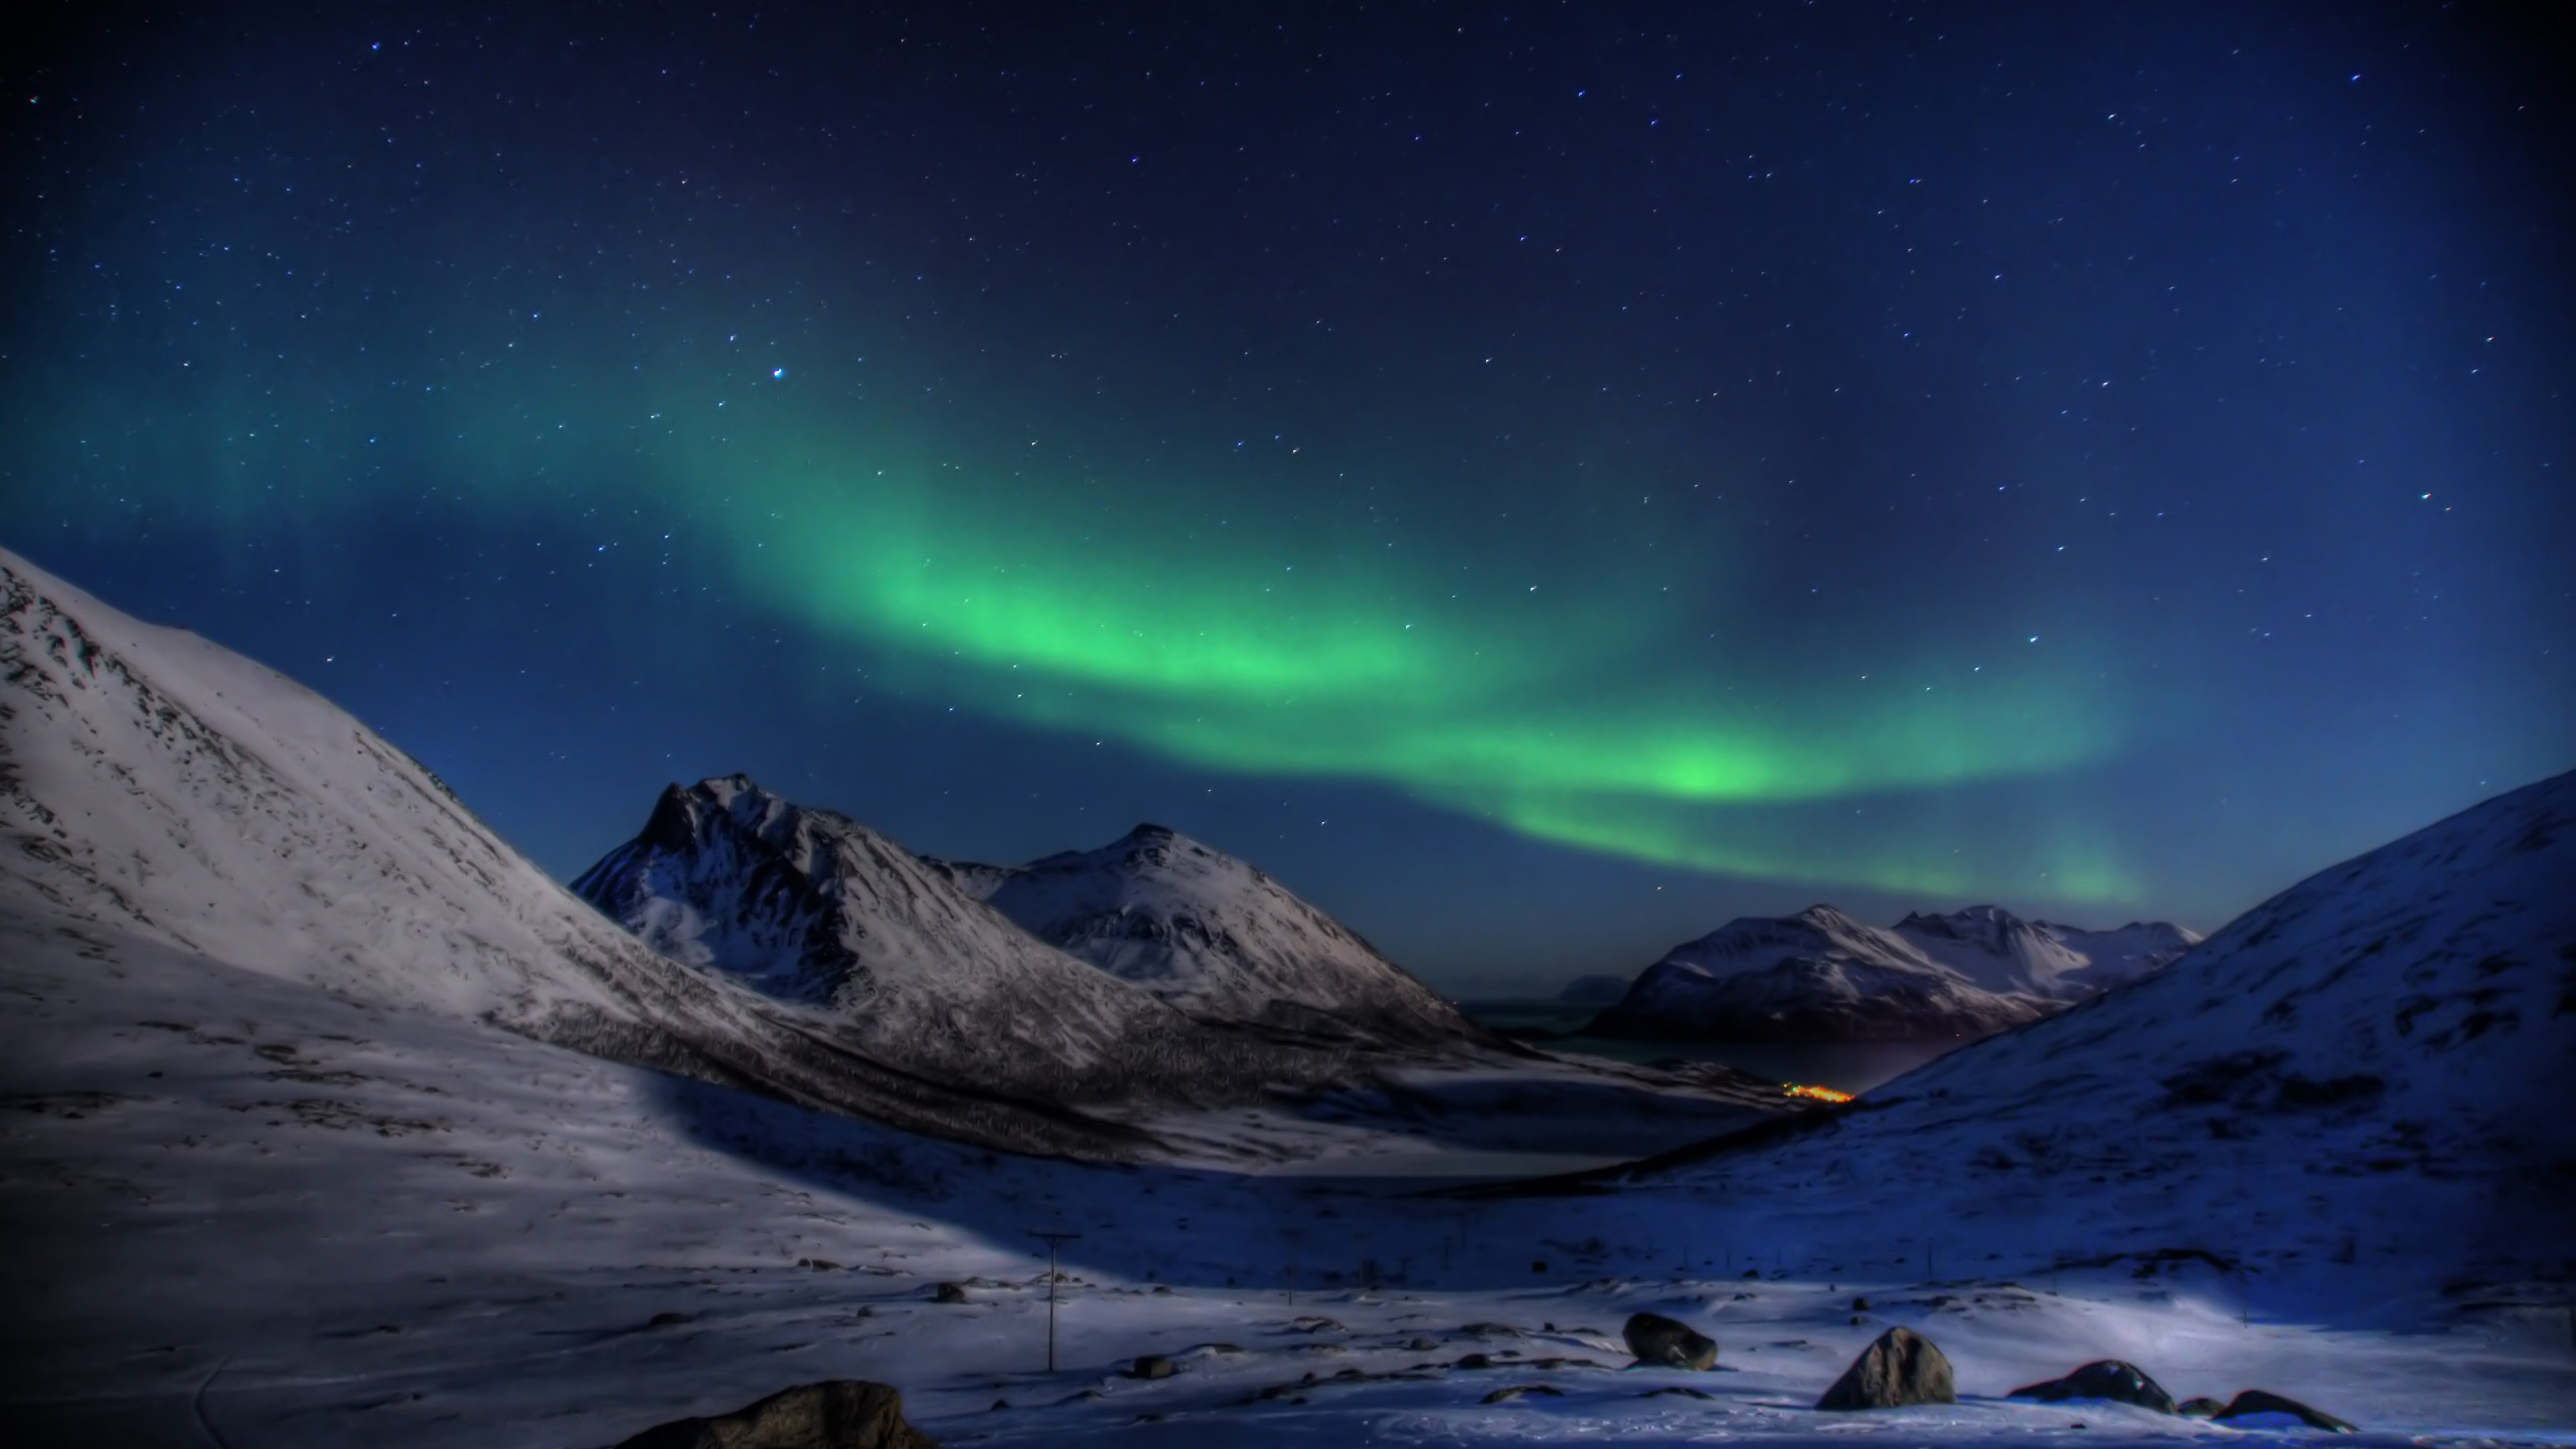 4k Hd Wallpapers 3840 2160: Aurora Borealis 4K Wallpaper [3840x2160]